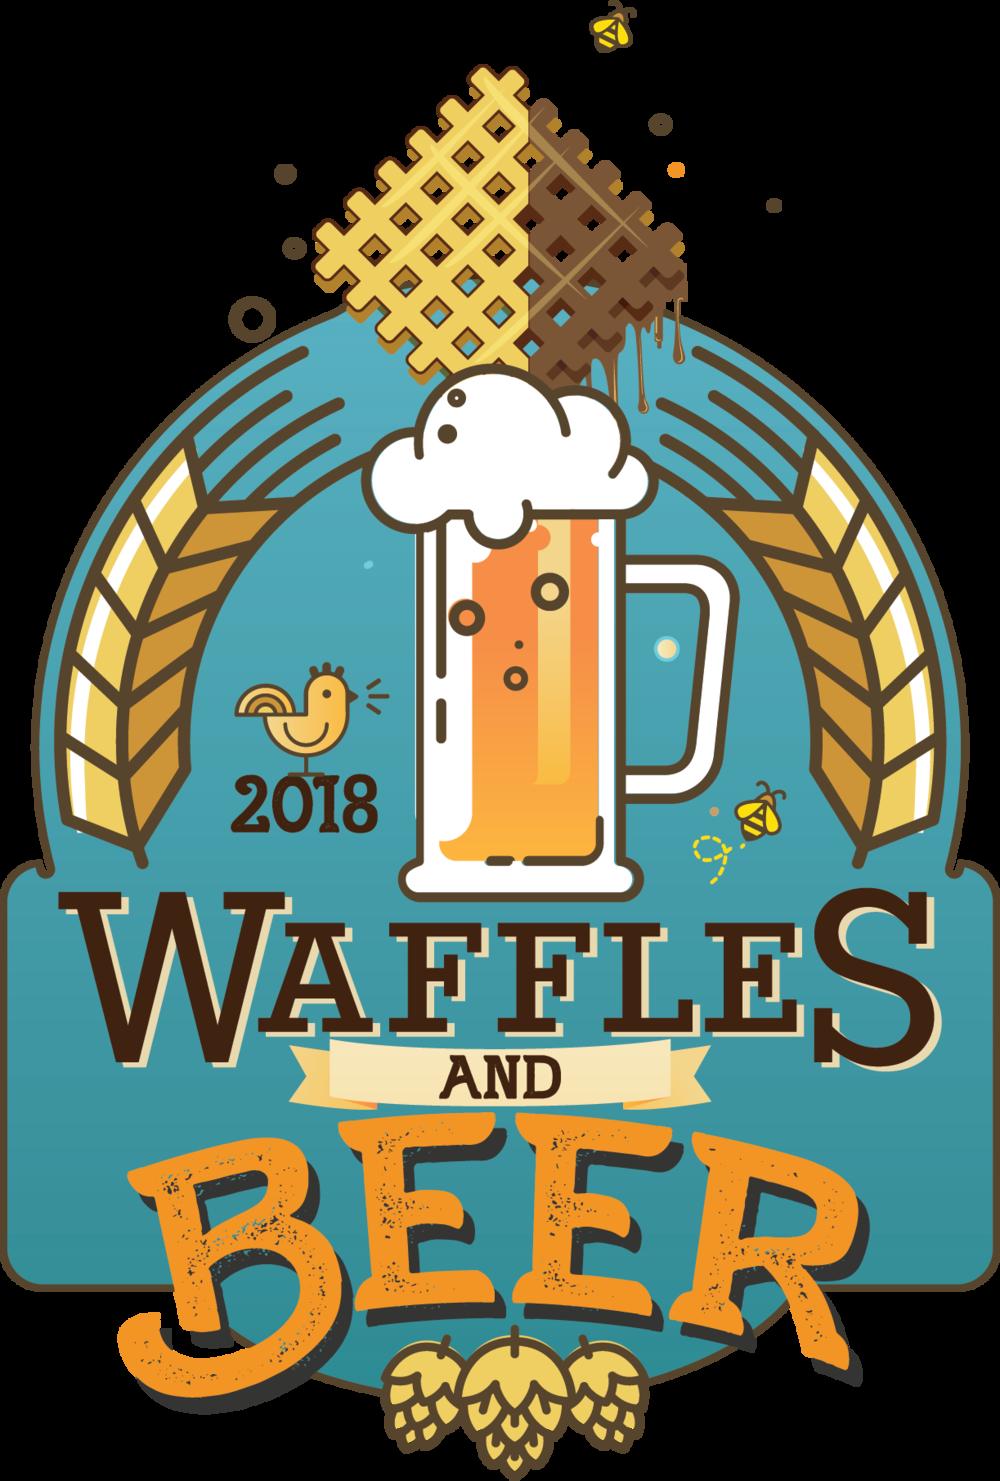 Waffle clipart wafle. Food vendor waffles and